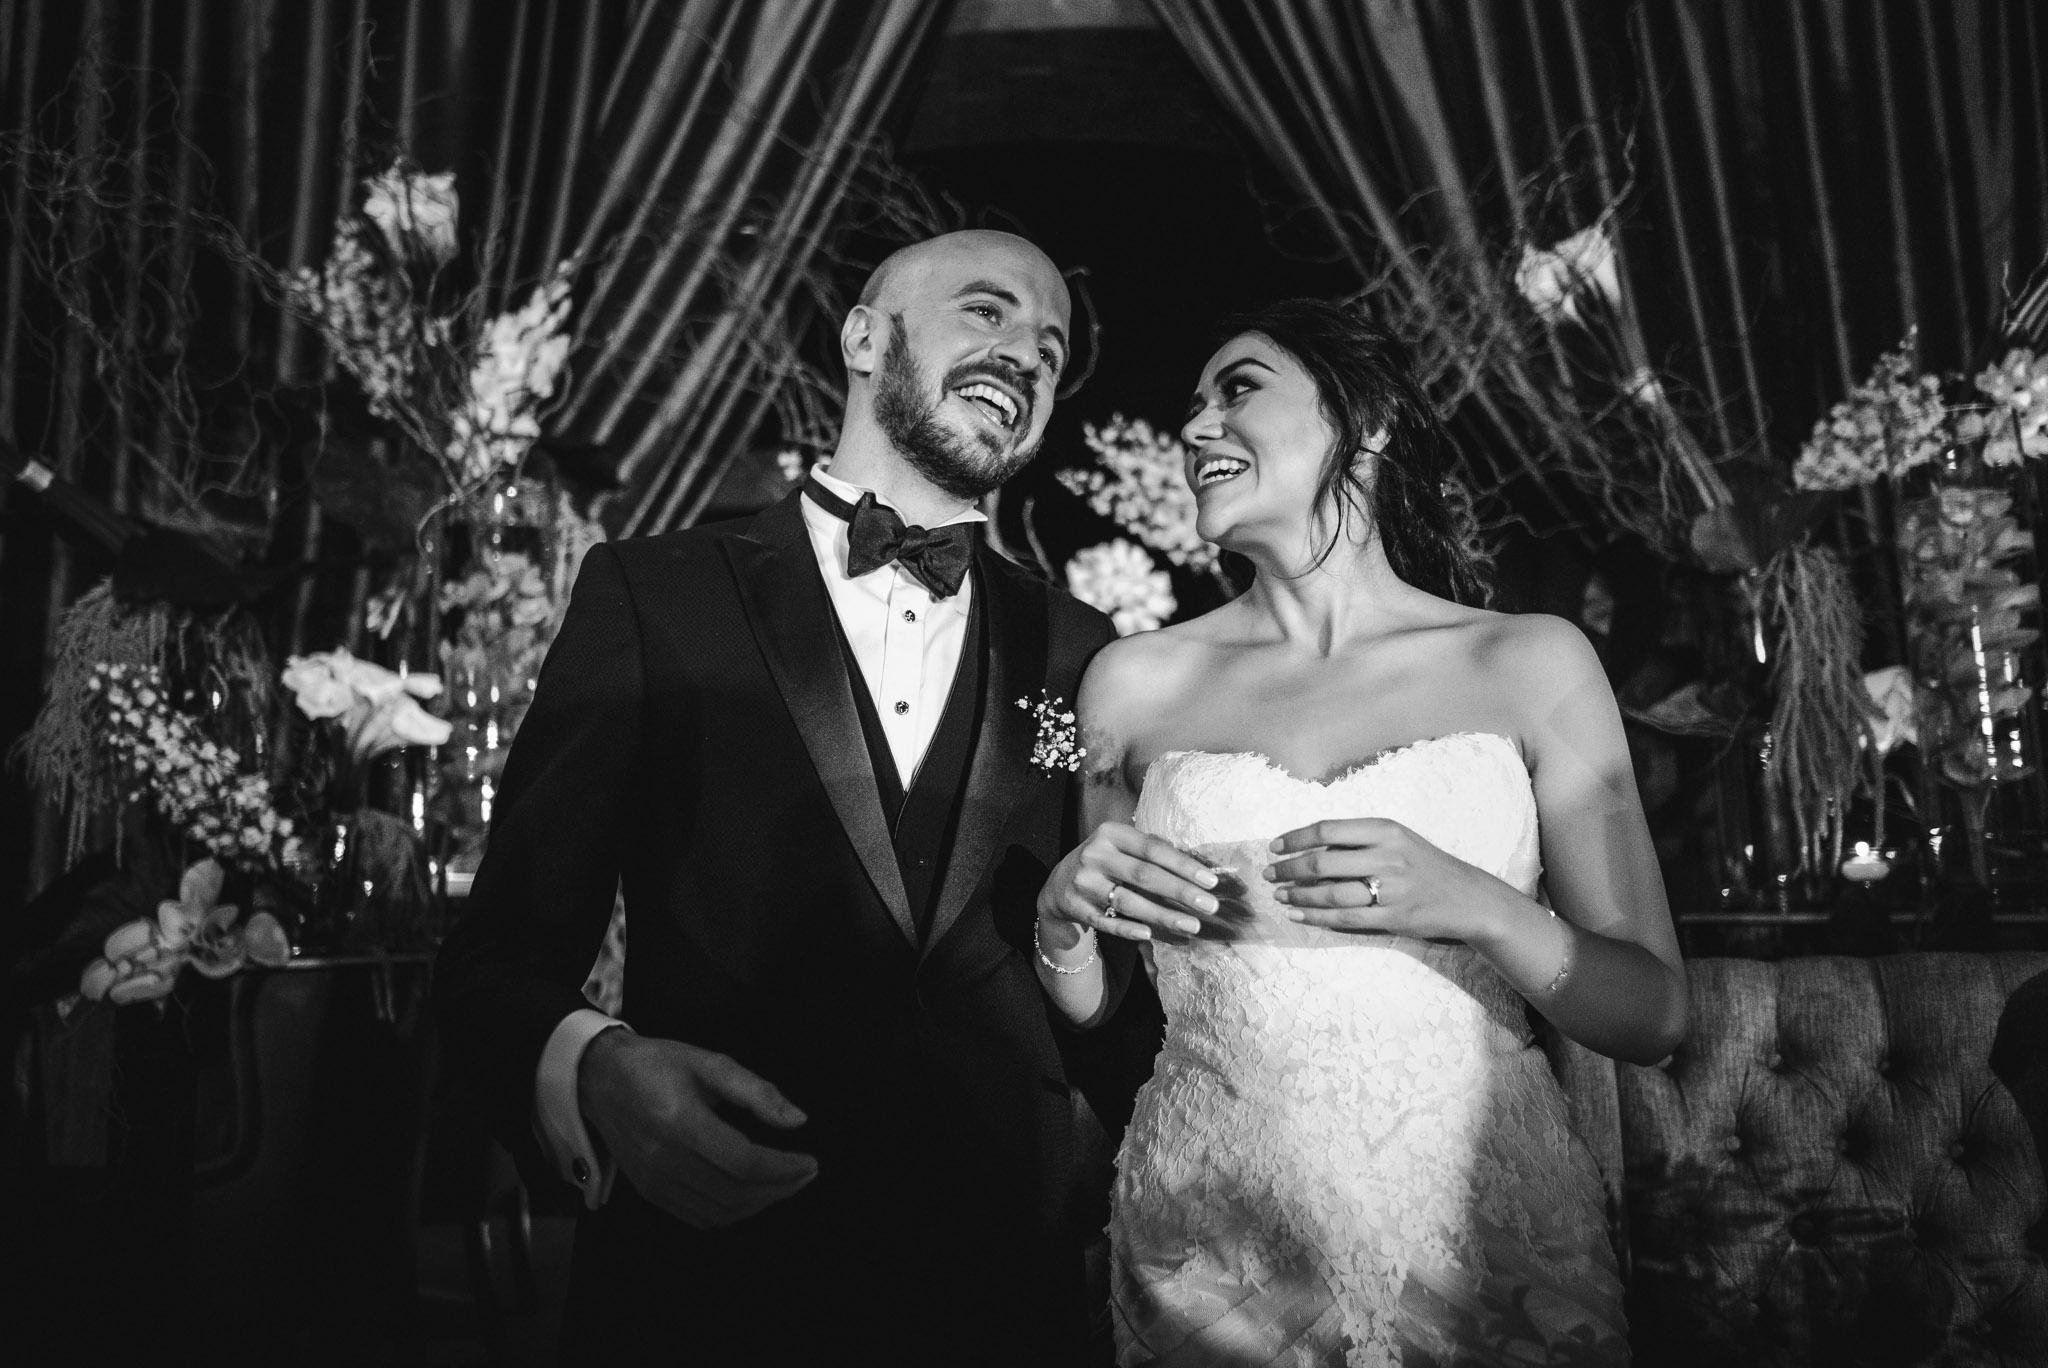 ©www.mauriziosolisbroca.com-20161002maurizio-solis-broca-mexico-canada-wedding-photographer20161002DSC05613-Edit.jpg